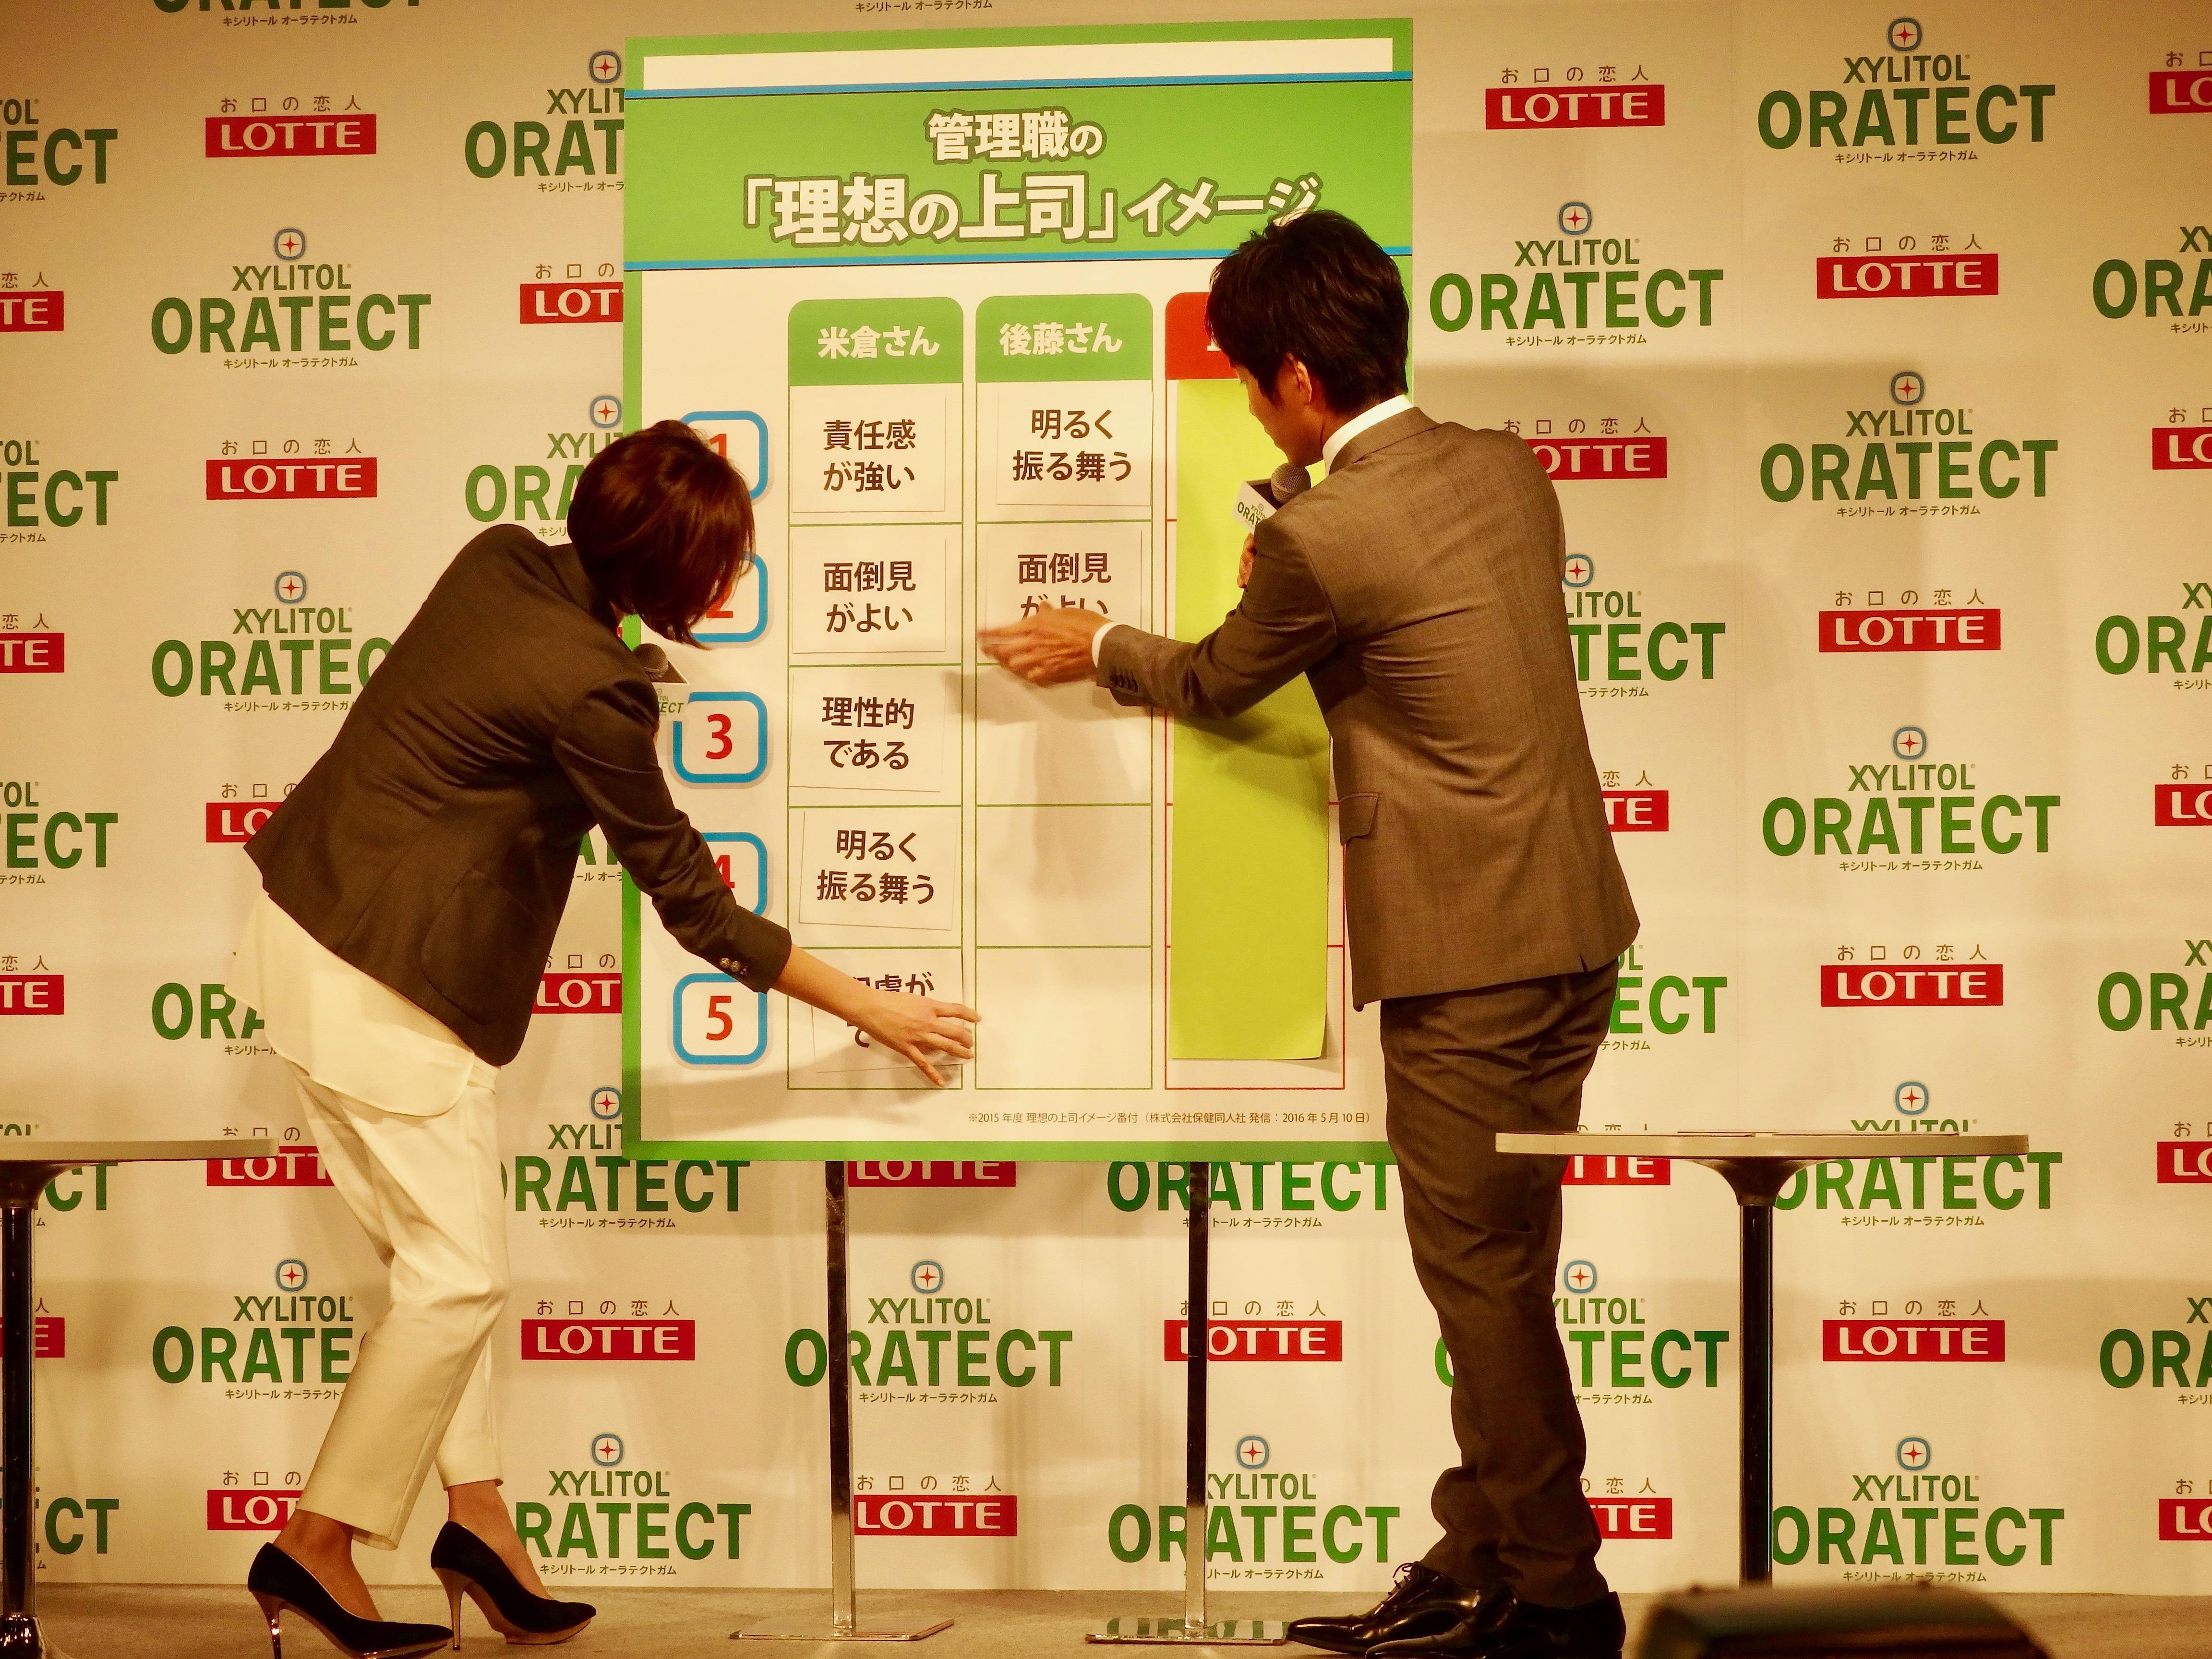 http://news.yoshimoto.co.jp/20170314201504-00a04a8662d3a7ab3d92892788b1200bb6245857.jpg